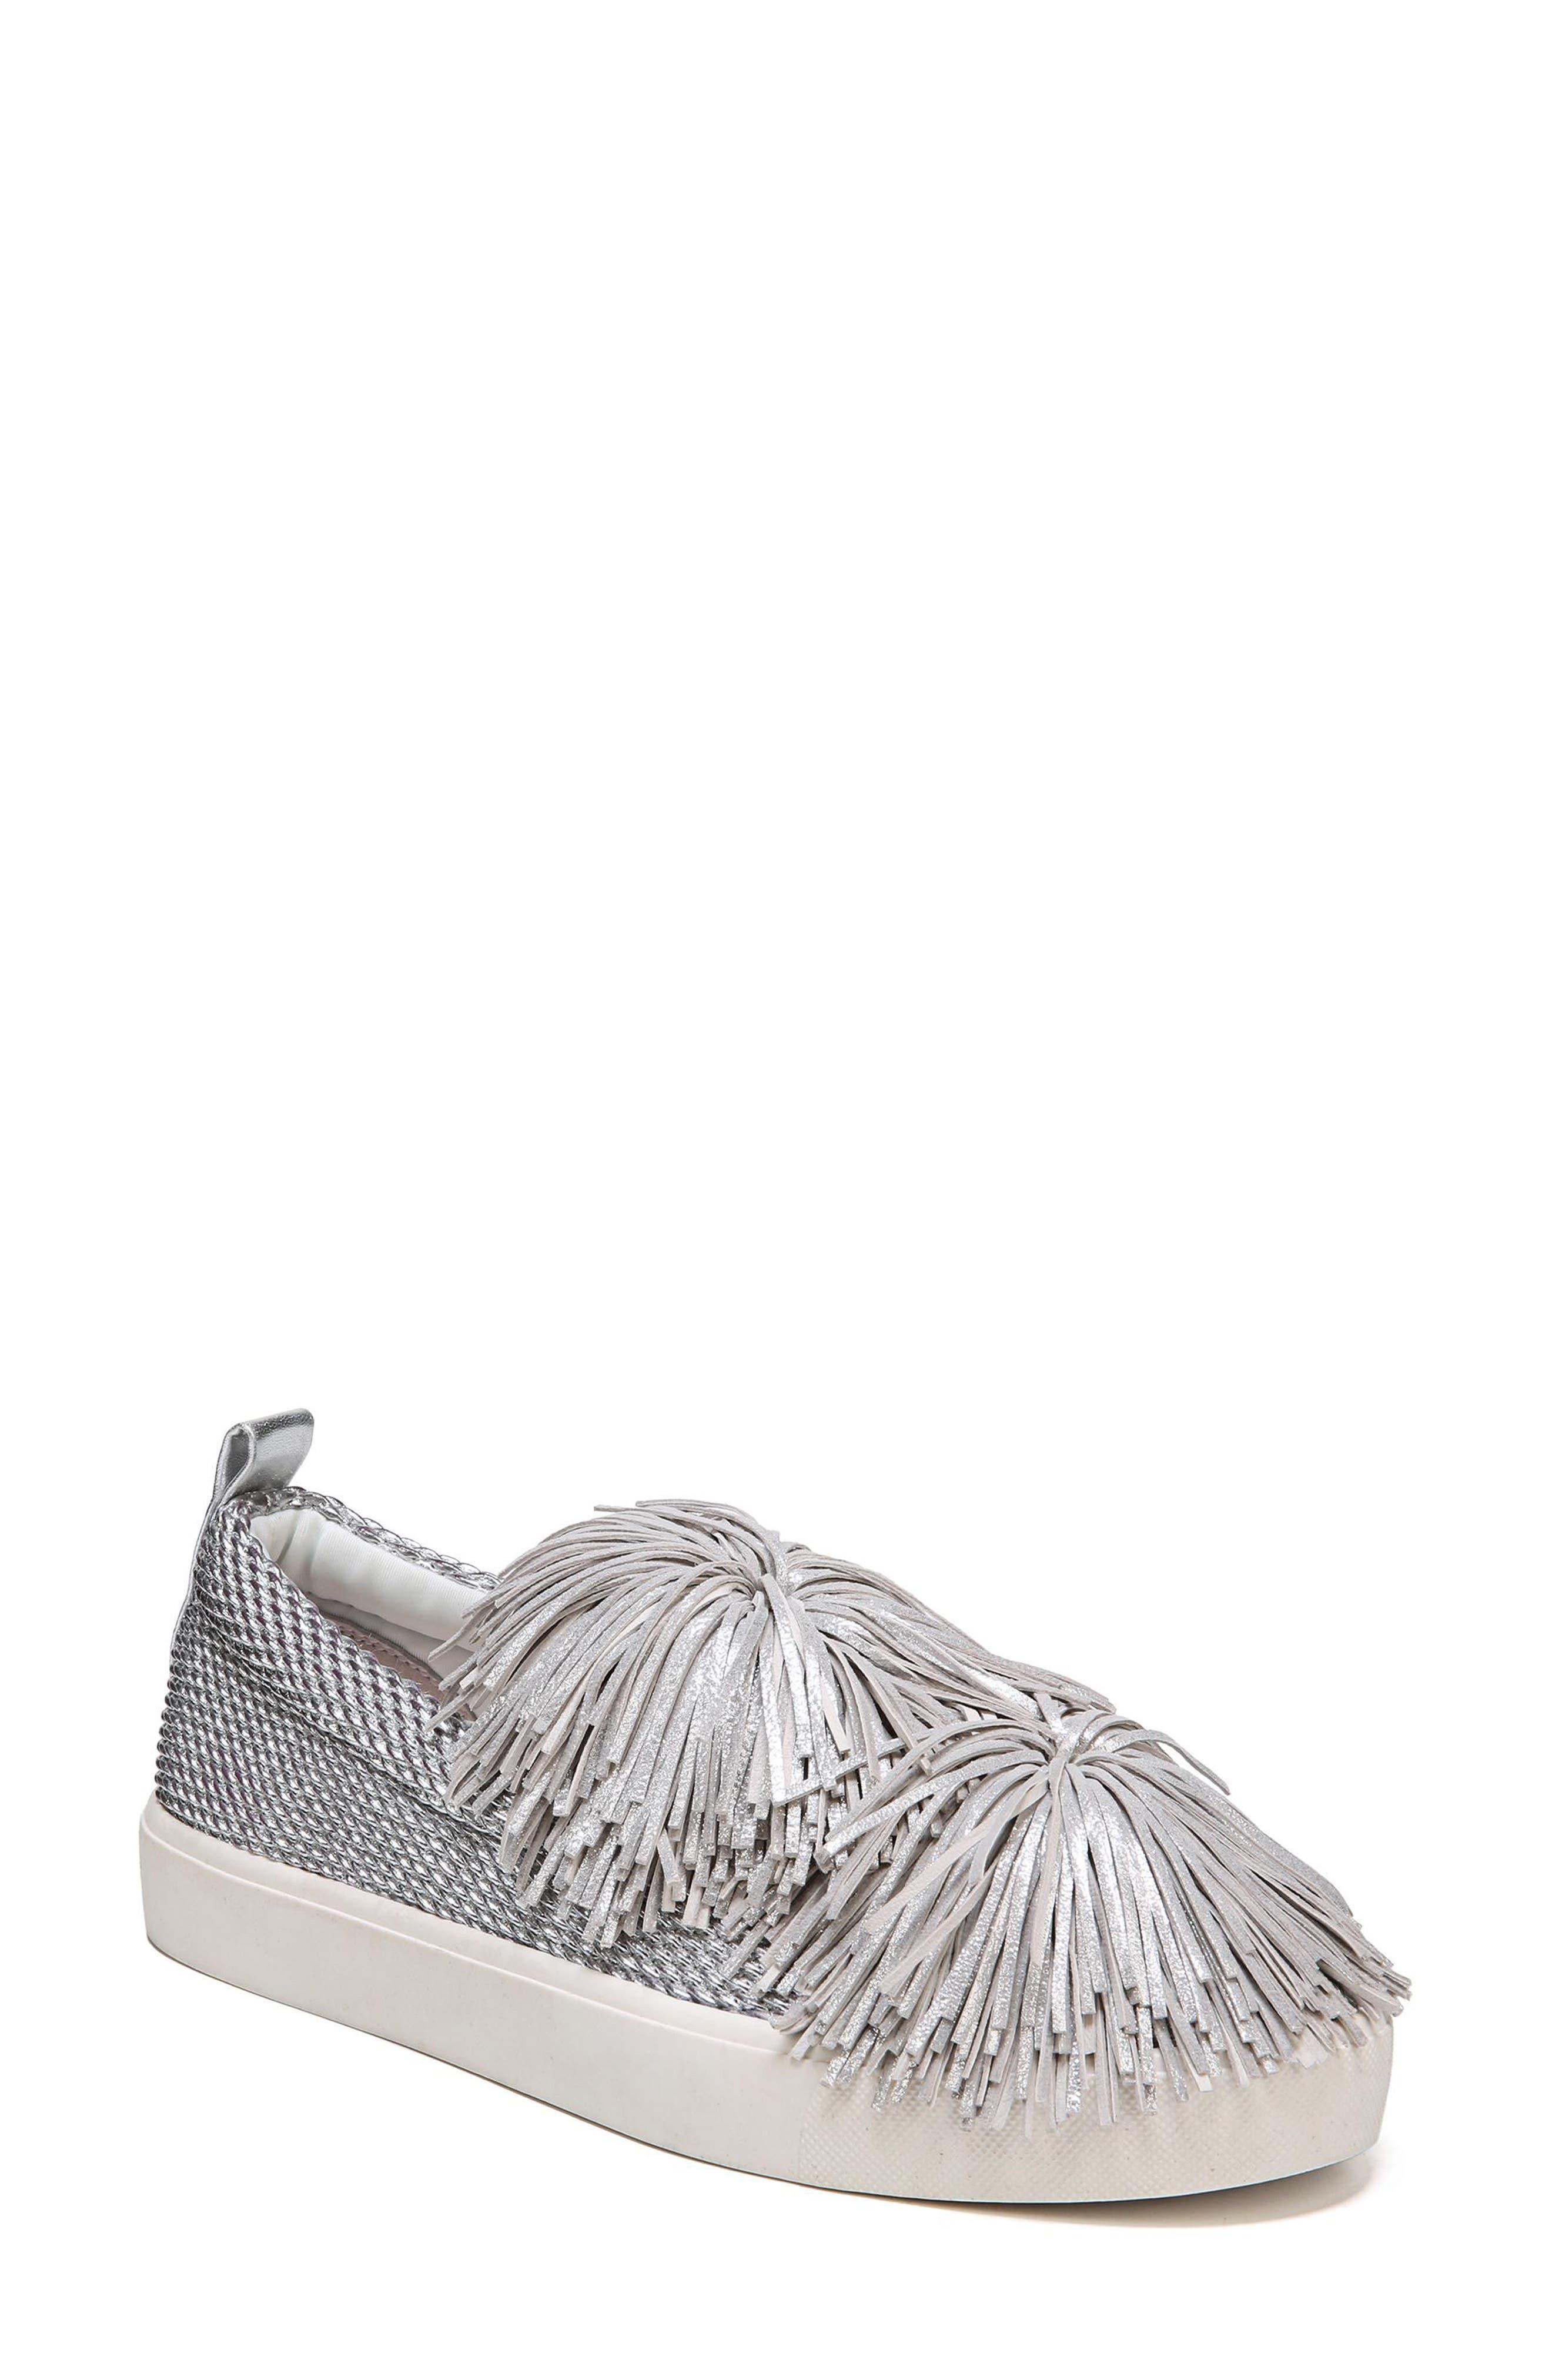 Emory Fringe Pompom Sneaker,                         Main,                         color, Metallic Silver